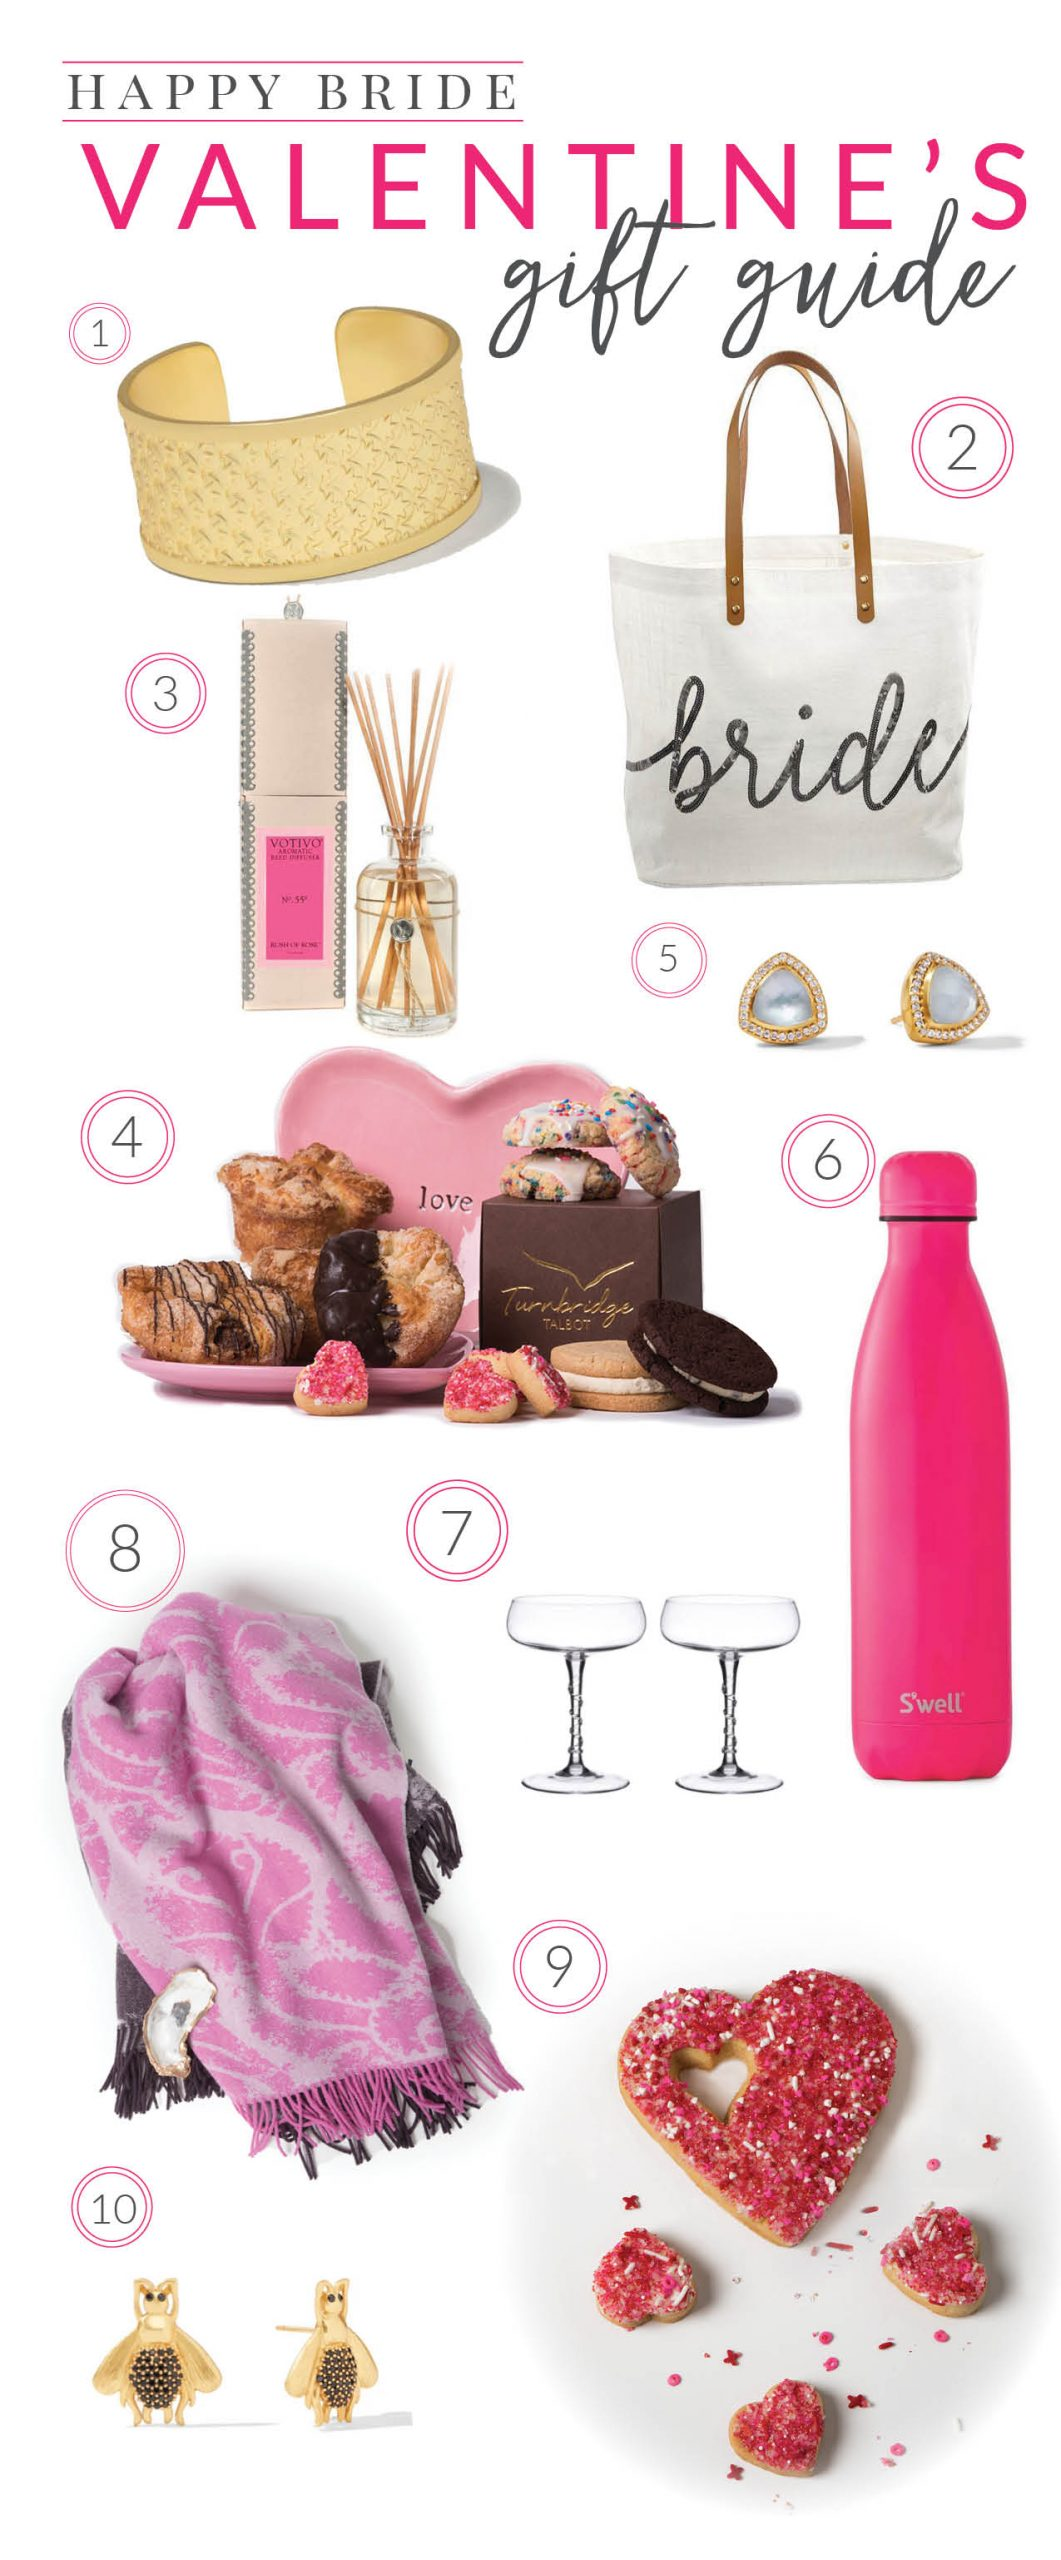 Last Minute Gift Guide for Valentine's Day | Dwelling Design | Turnbridge Talbot | Chesapeake Bay Beach Club